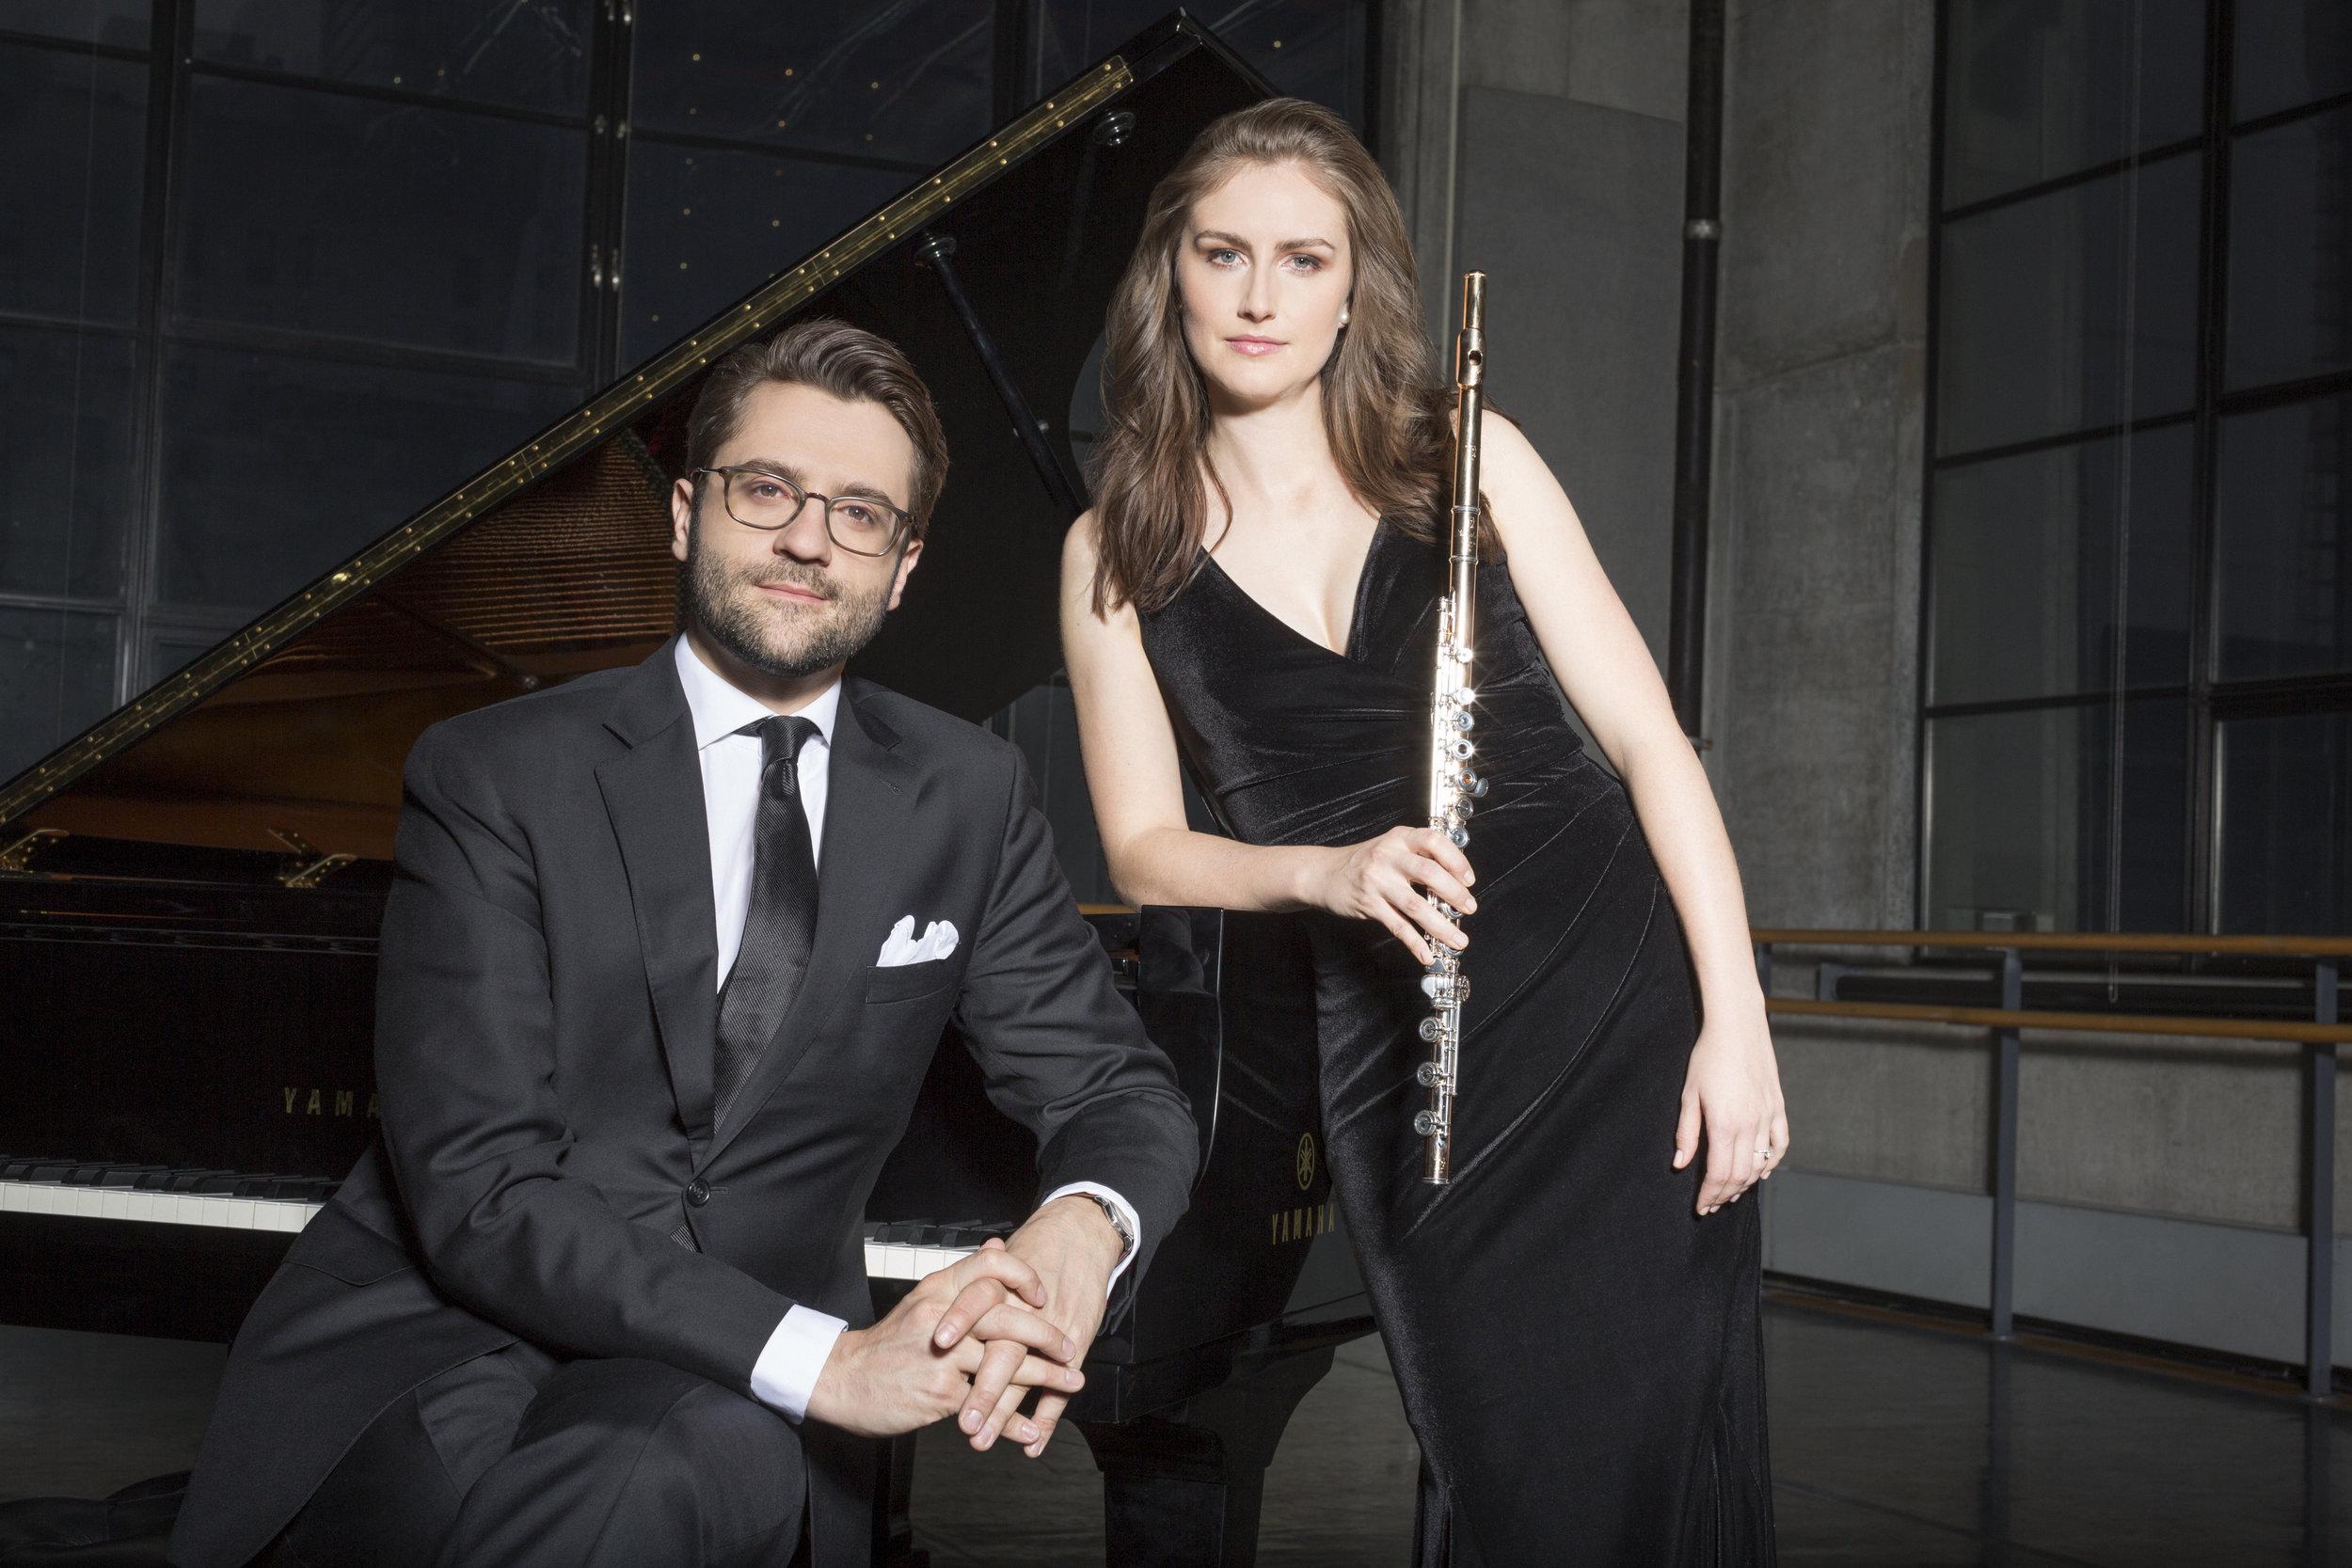 Catherine Gregory and David Kaplan, Dario Acosta 2017